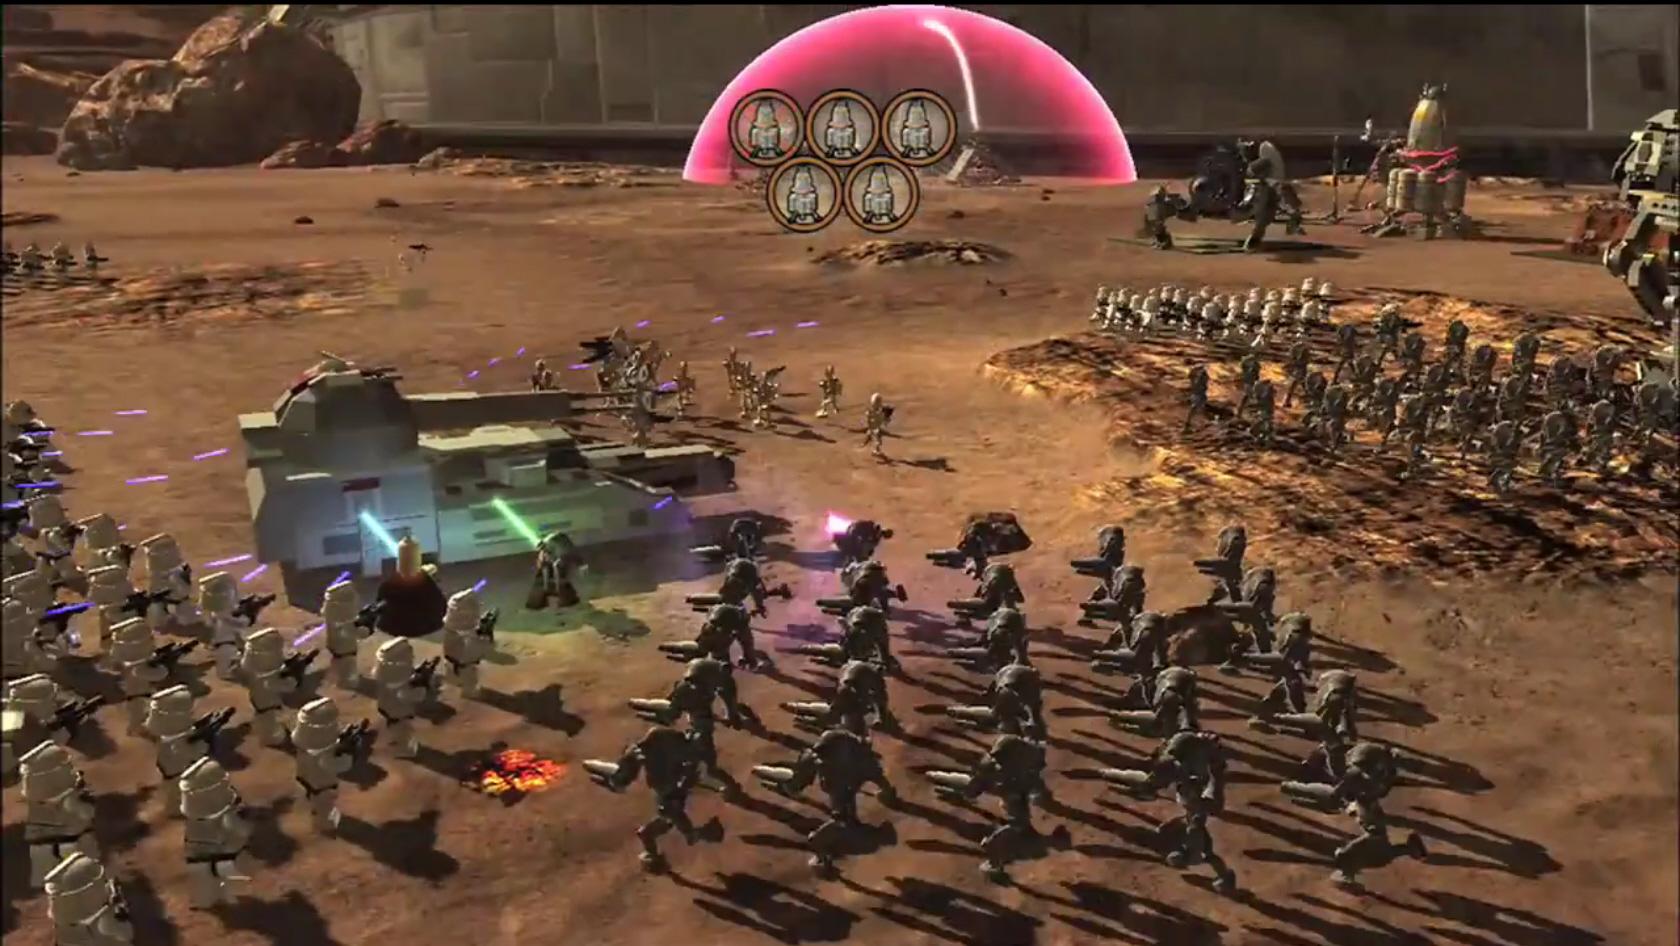 Videogame Source: LEGO Star Wars III video, Nintendo 3DS